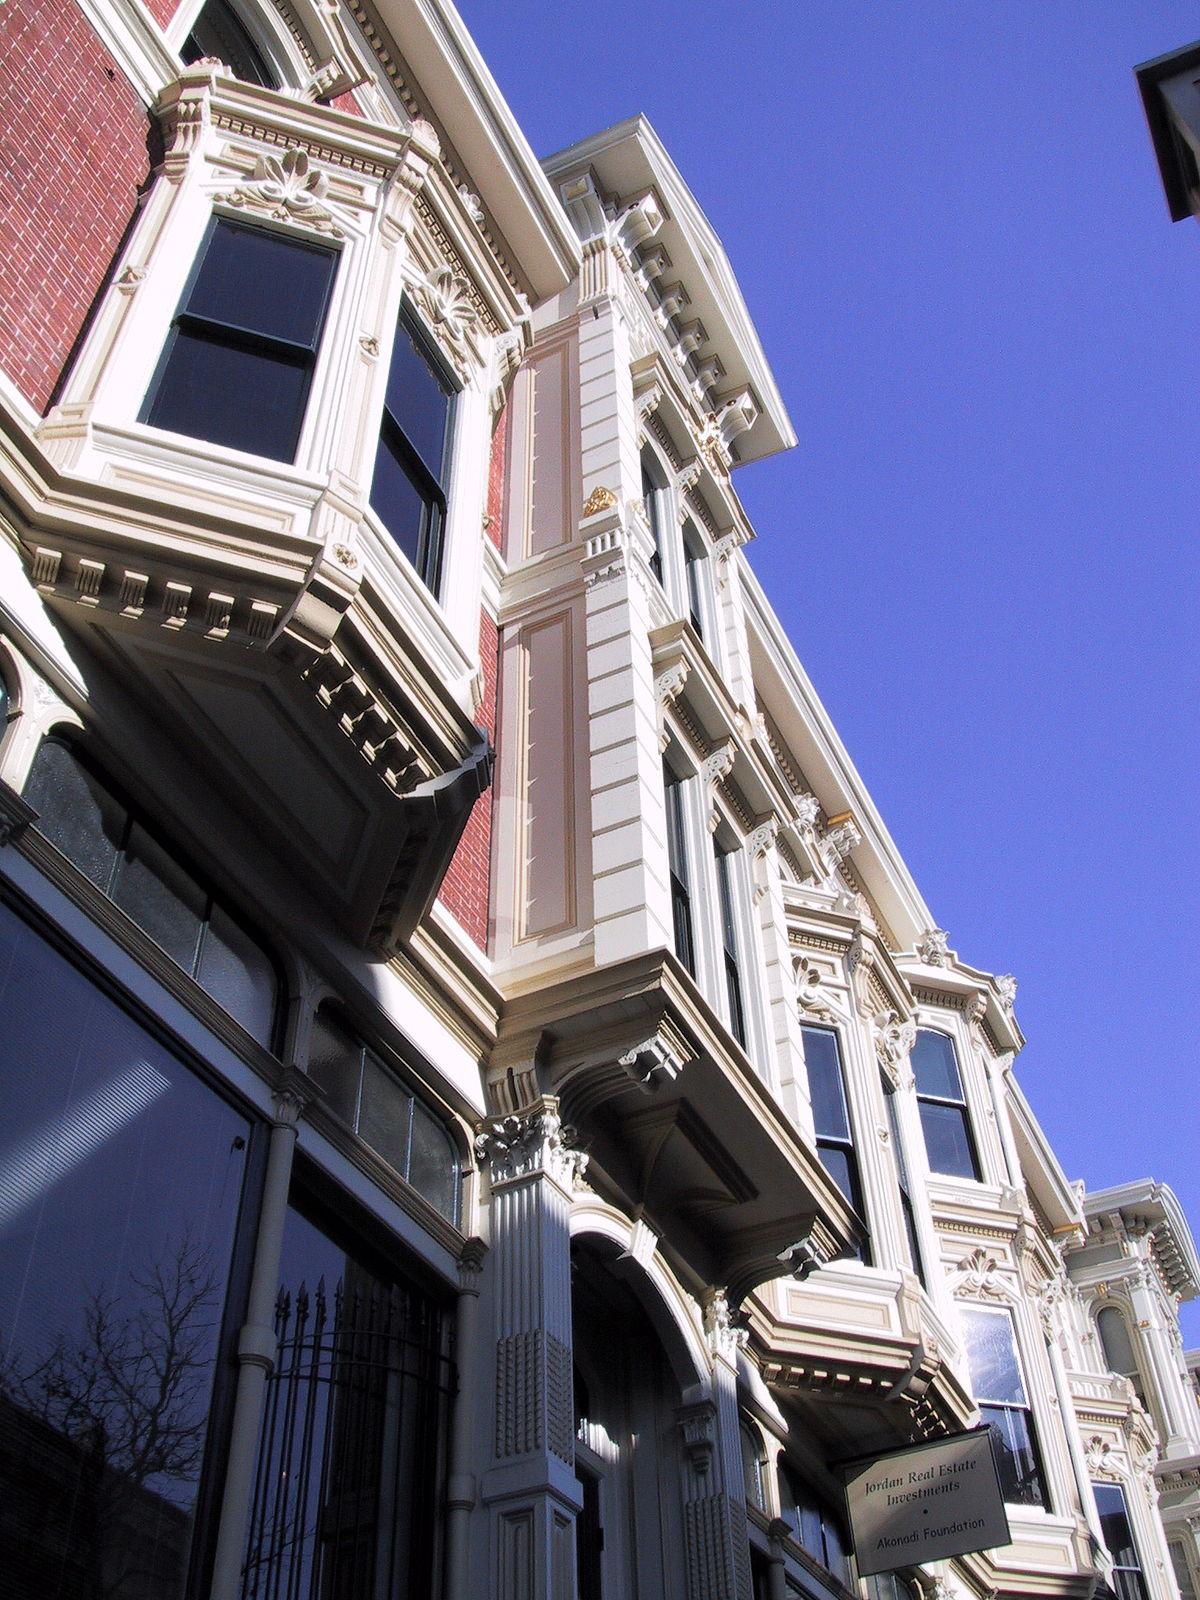 Architecture victorienne wikip dia for Architecture victorienne a londres